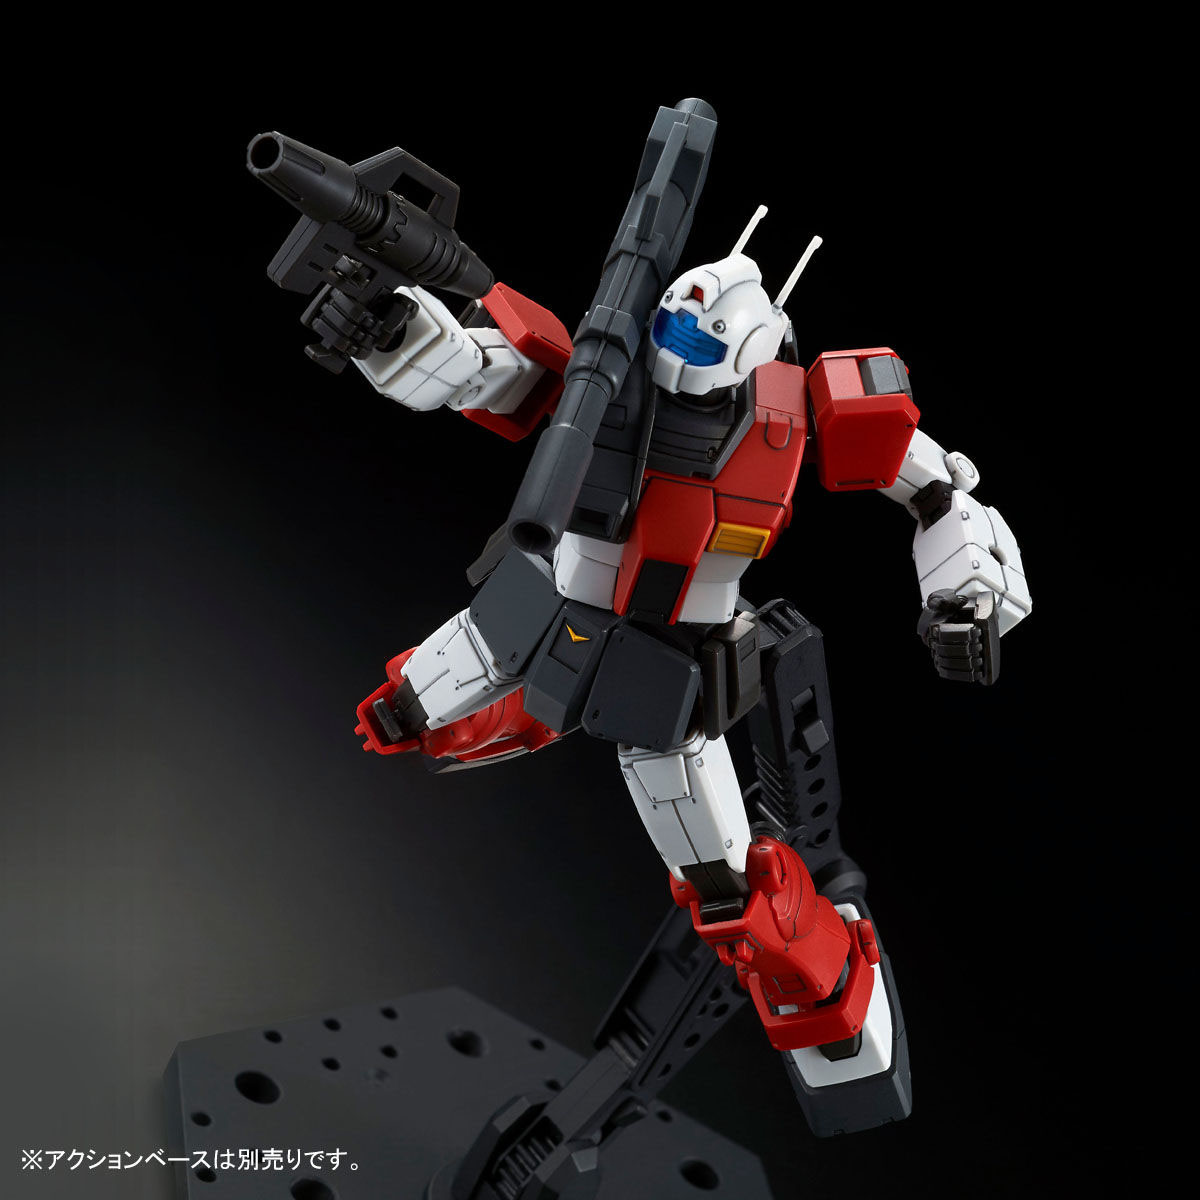 HG 1/144『ジム・キャノン(空間突撃仕様)』機動戦士ガンダム THE ORIGIN MSD プラモデル-007